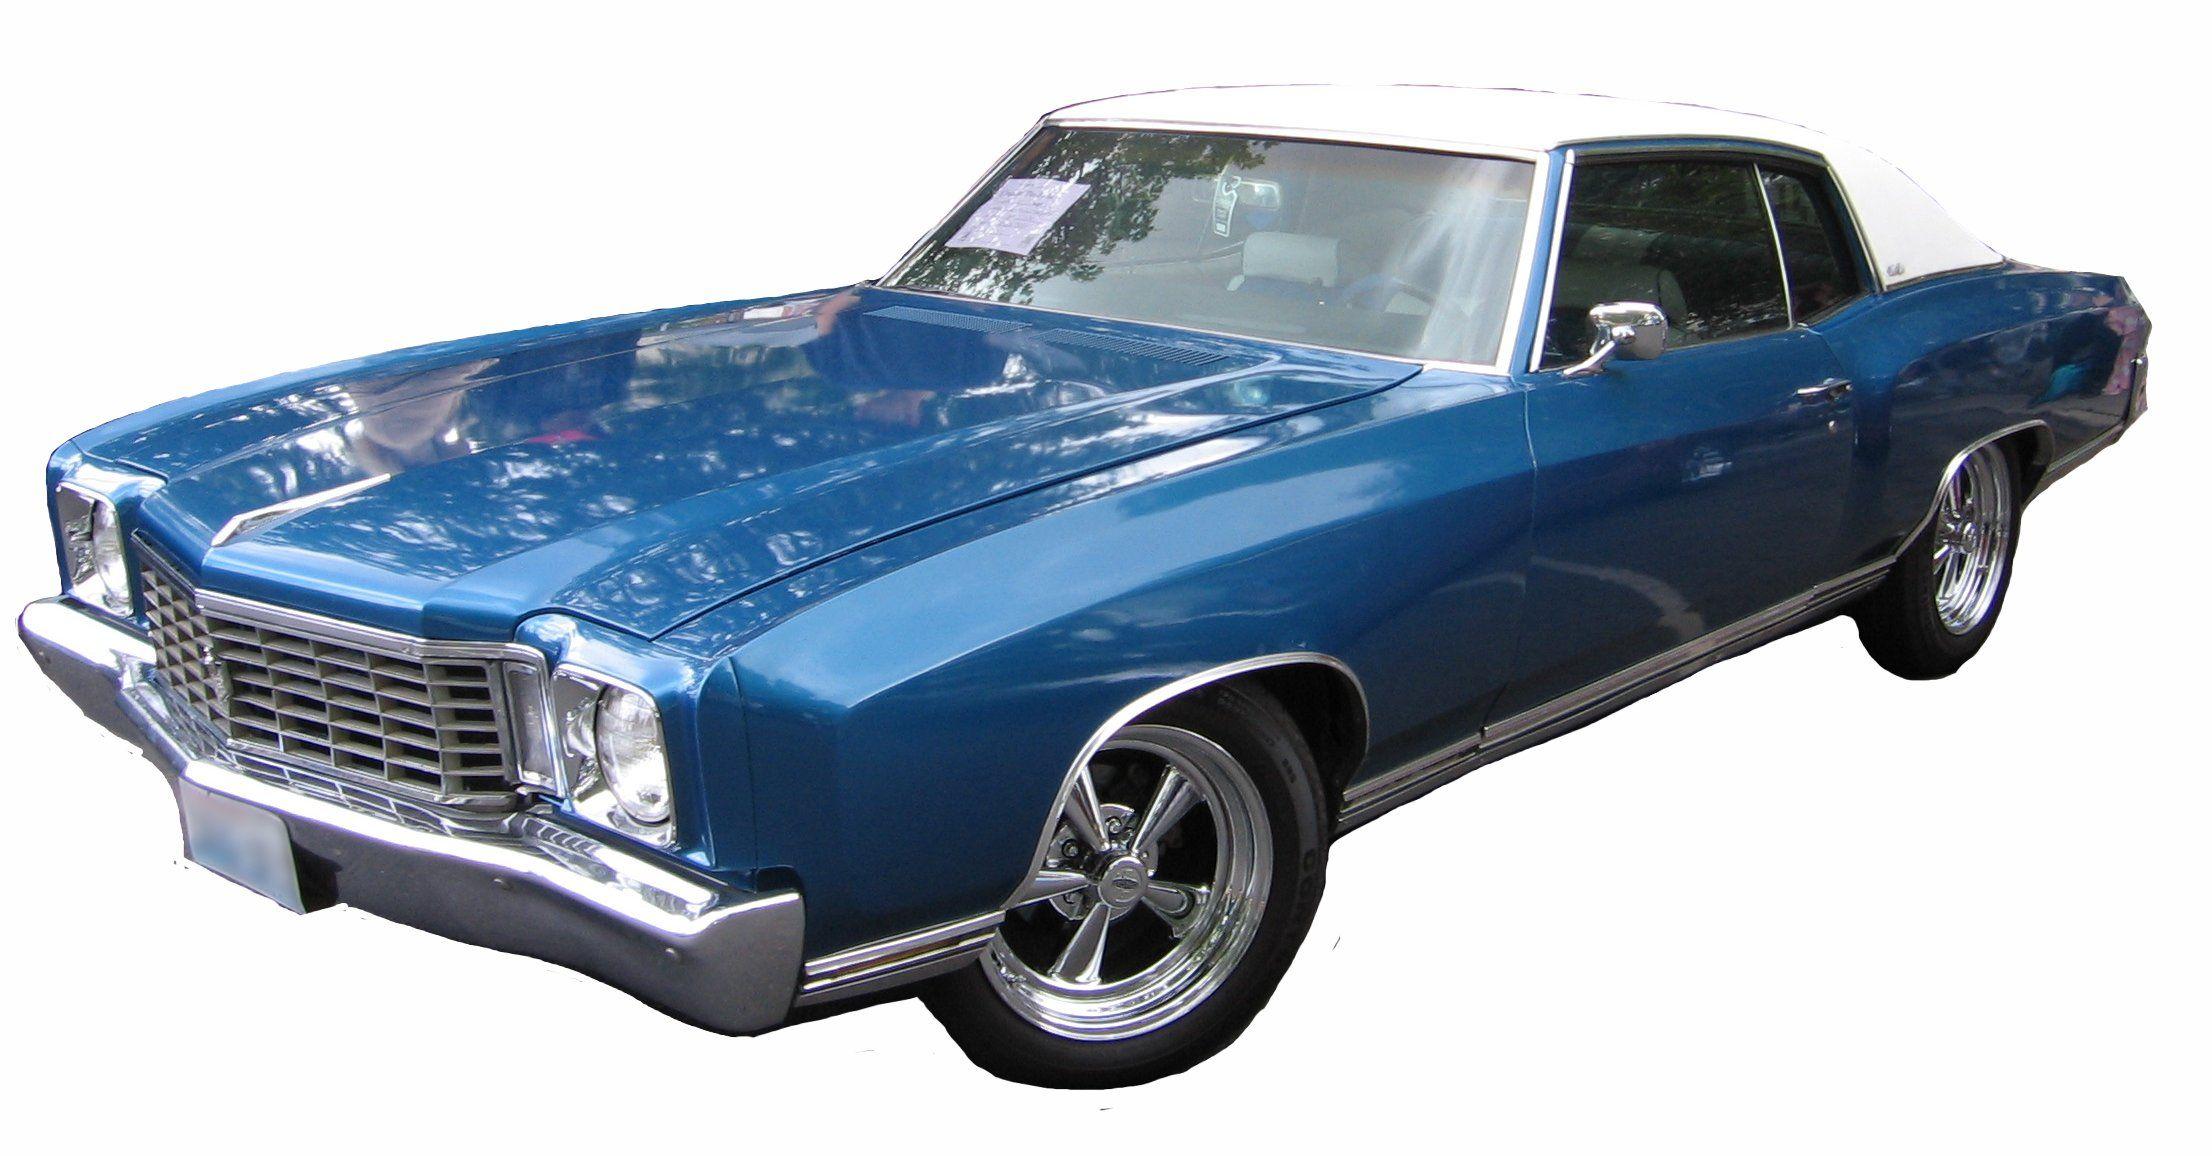 1972 Chevy Monte Carlo Convertible Chevrolet Monte Carlo Chevrolet Monte Carlo